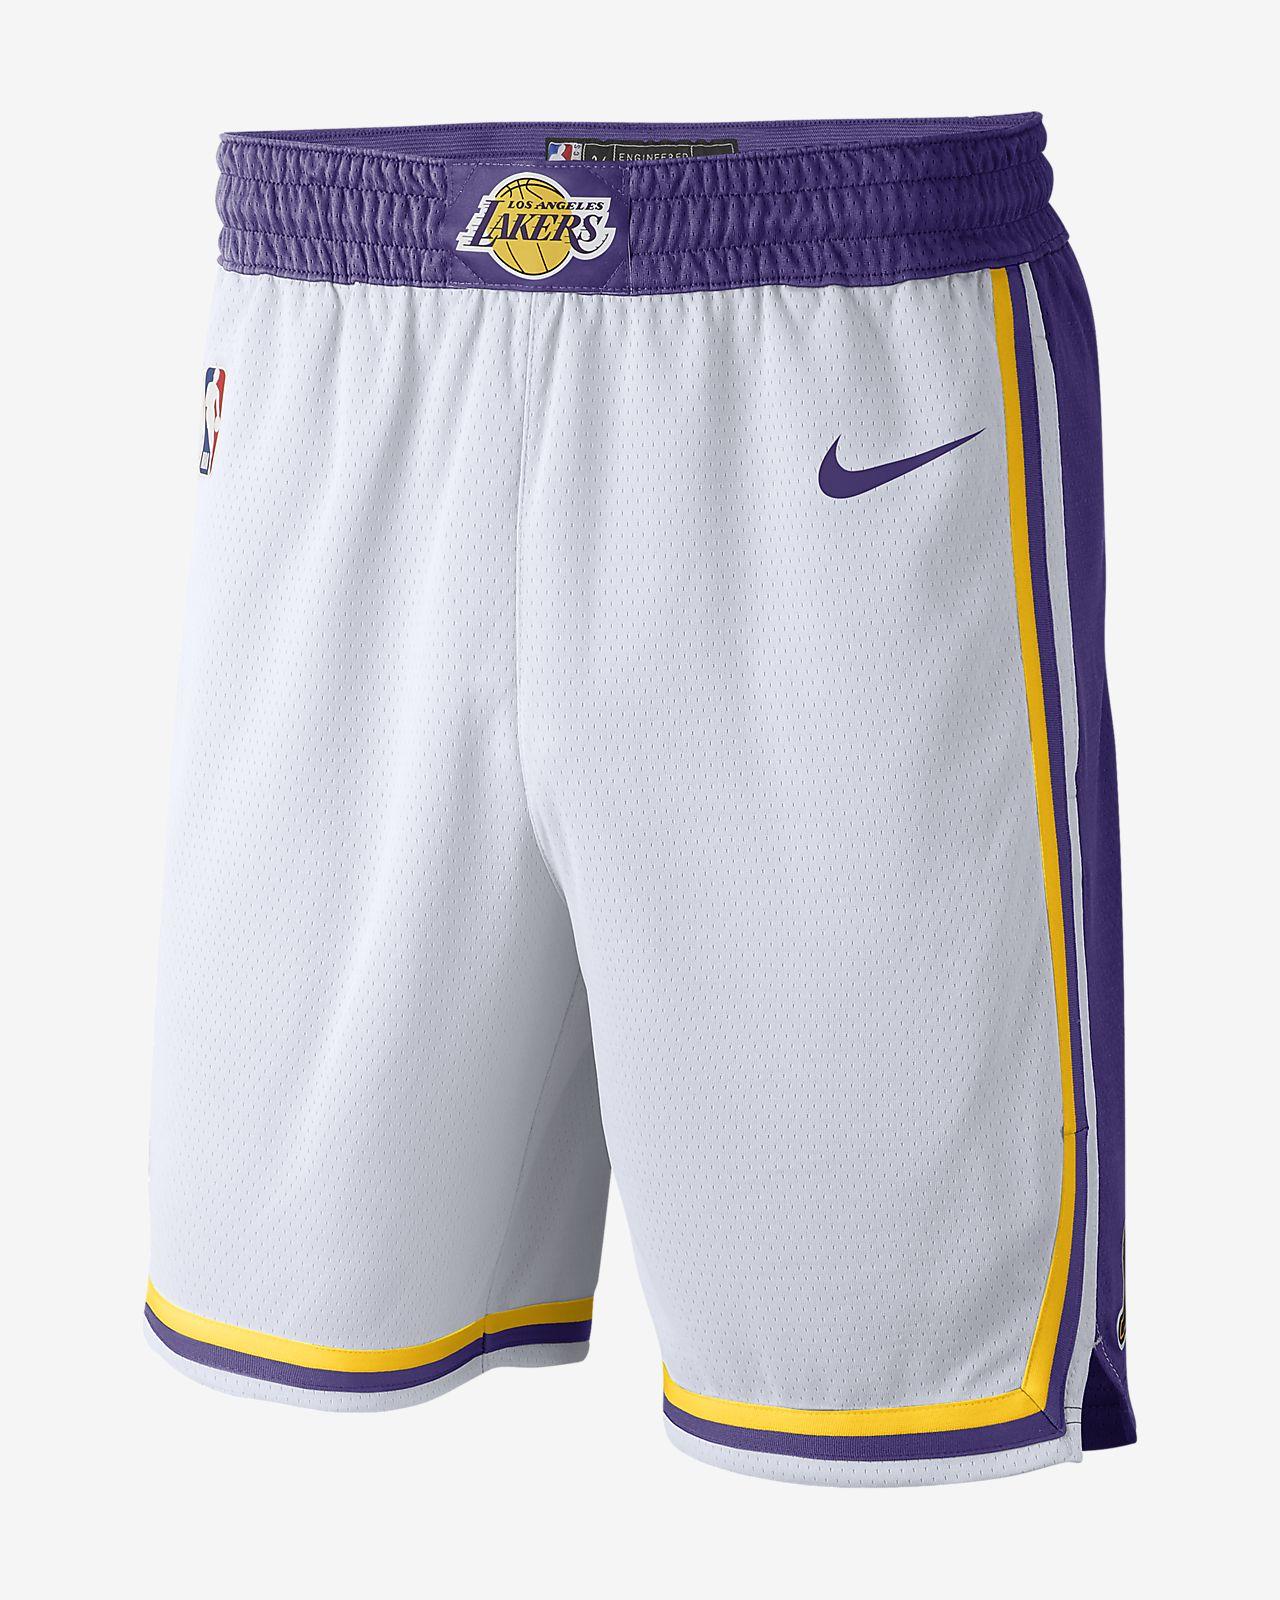 Los Angeles Lakers Association Edition Swingman Pantalón corto Nike de la NBA - Hombre